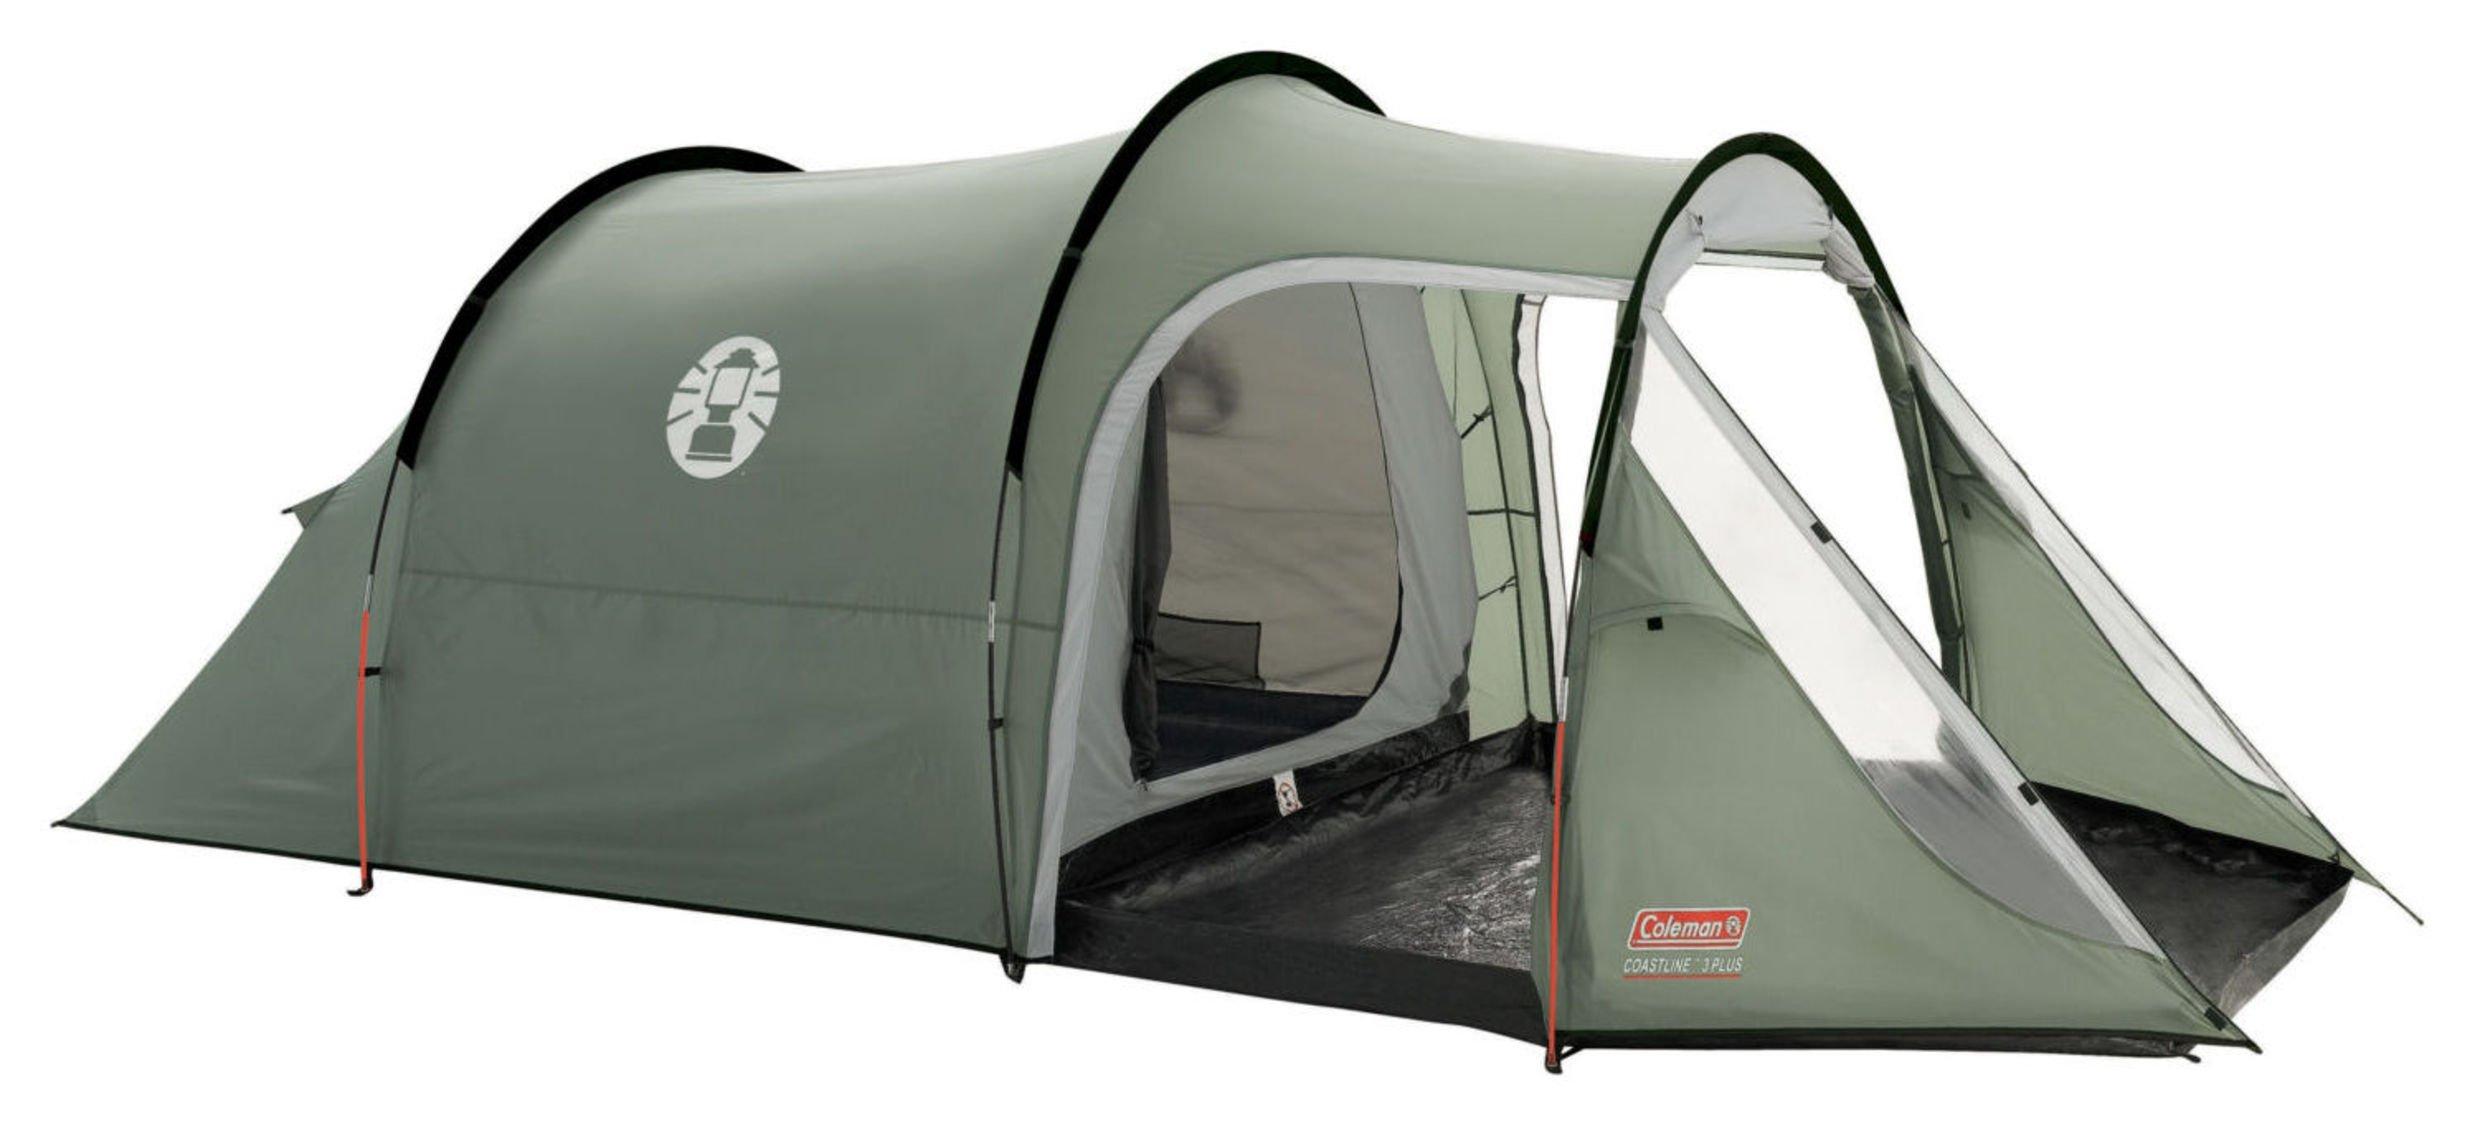 Image of Coleman Coastline 3 Man Tunnel Tent